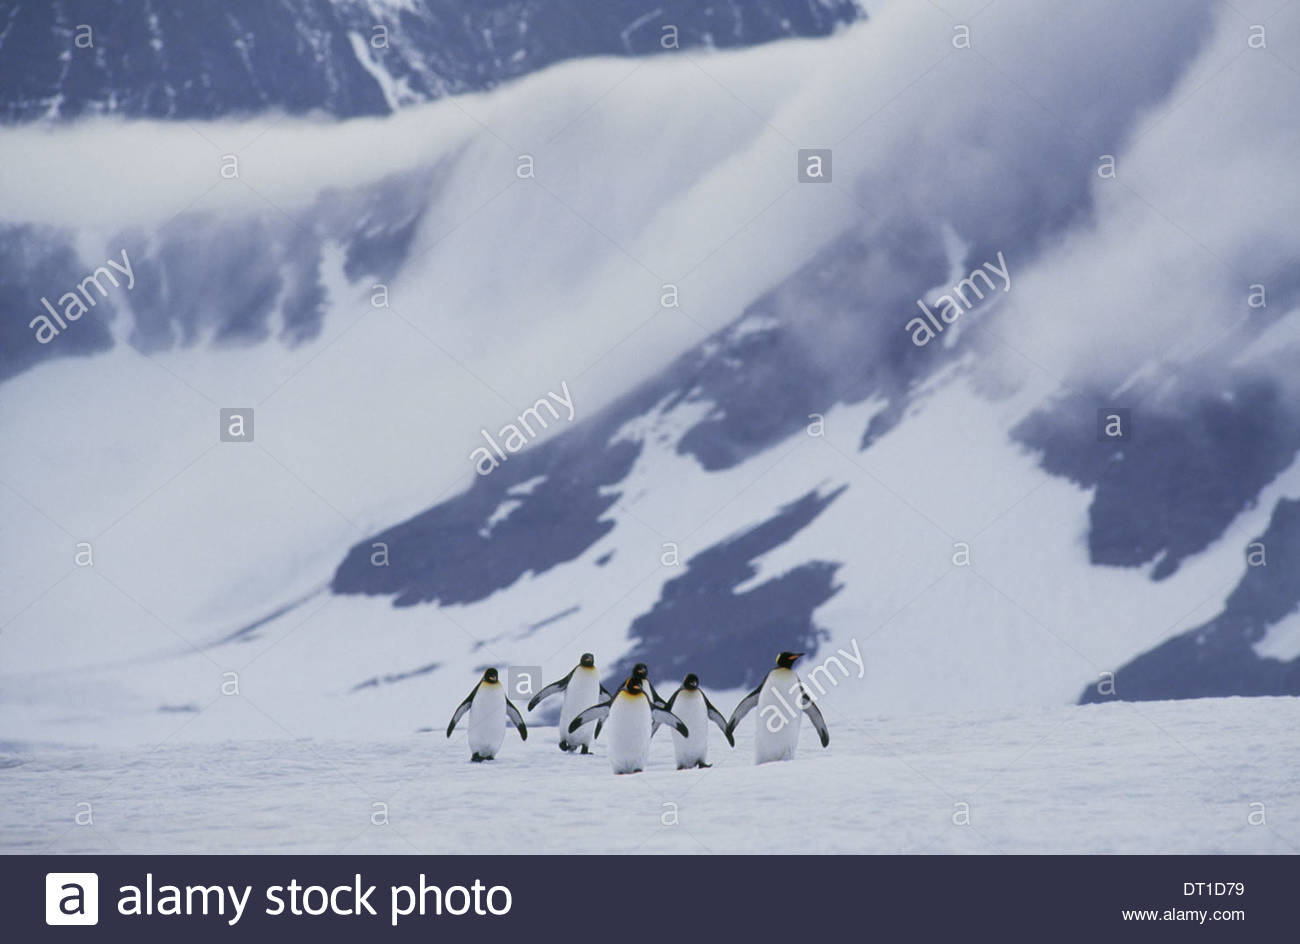 South Georgia Island Königspinguine überqueren Eis Aptenodytes patagonicus Stockbild